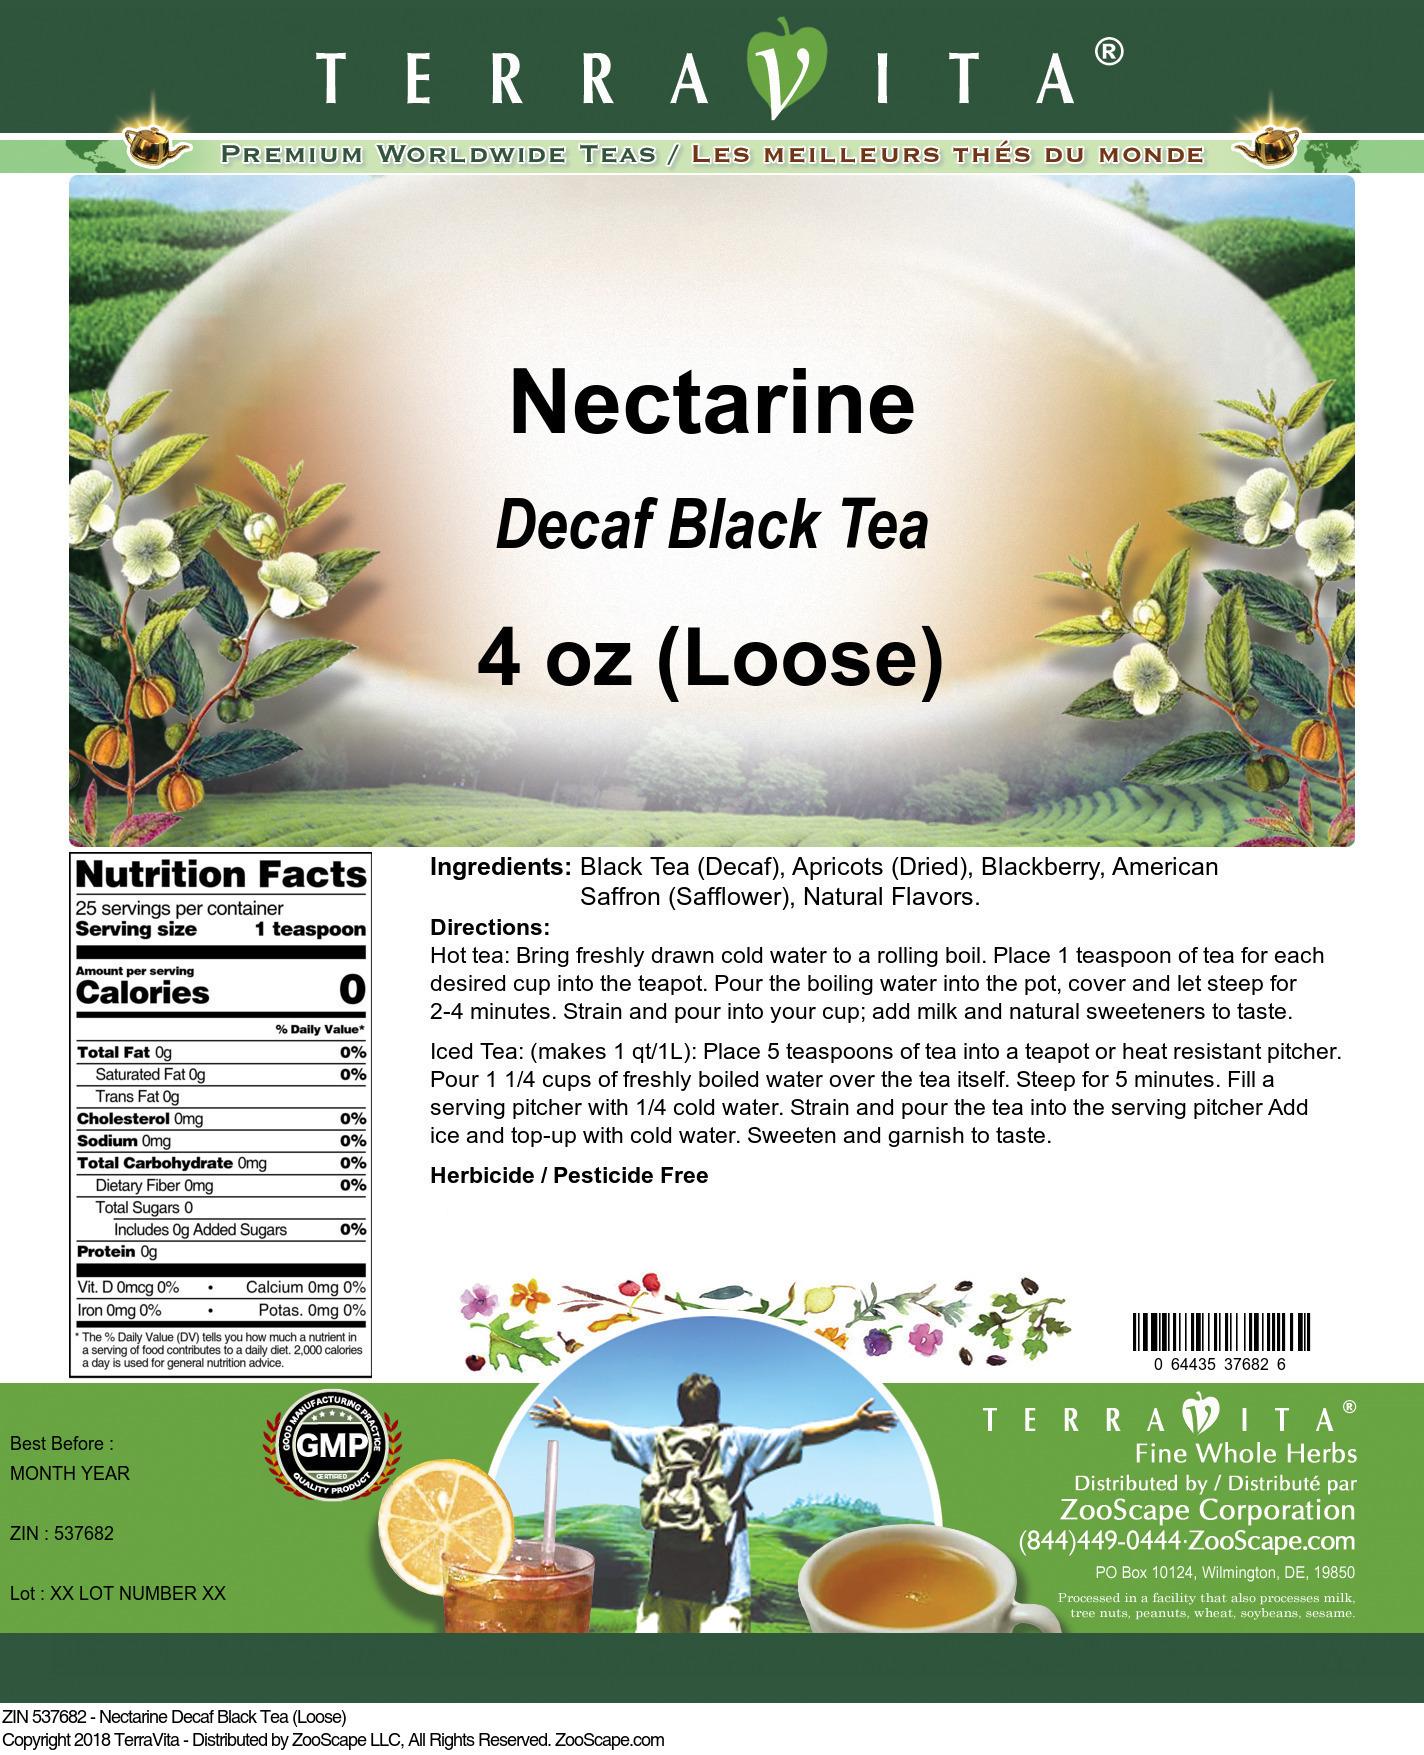 Nectarine Decaf Black Tea (Loose)